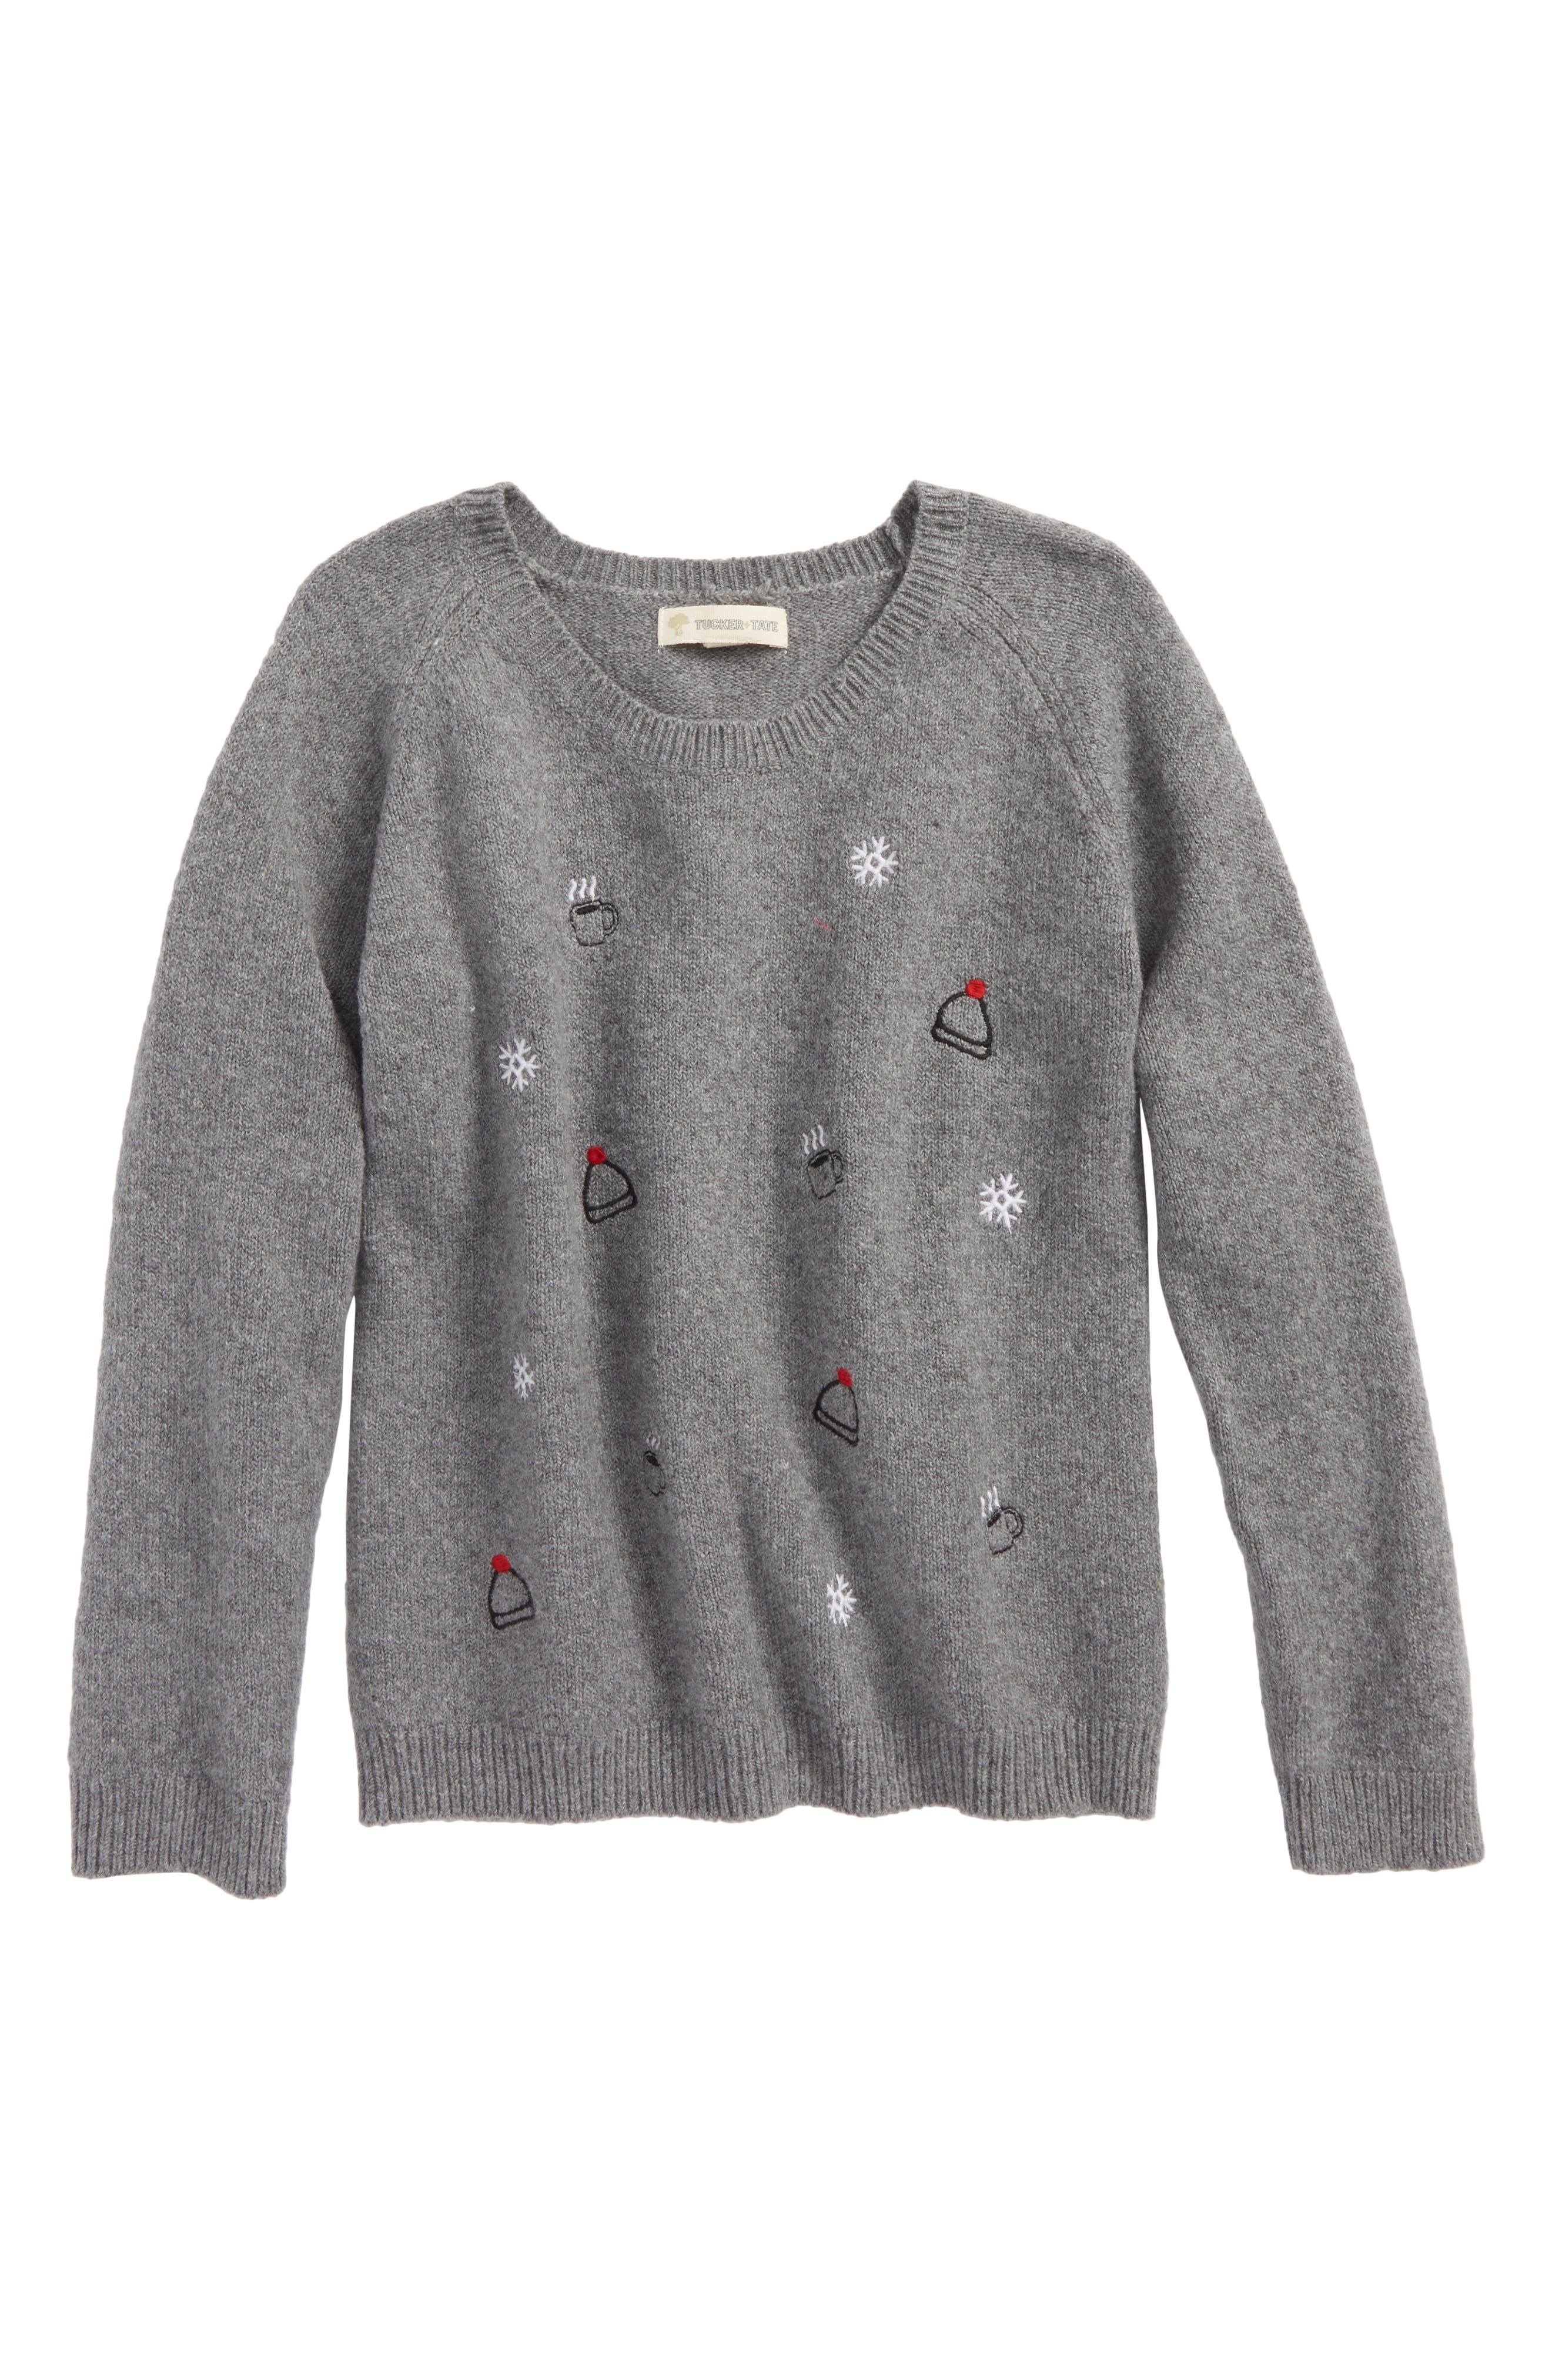 Alternate Image 1 Selected - Tucker + Tate Embroidered Sweater (Toddler Girls, Little Girls & Big Girls)